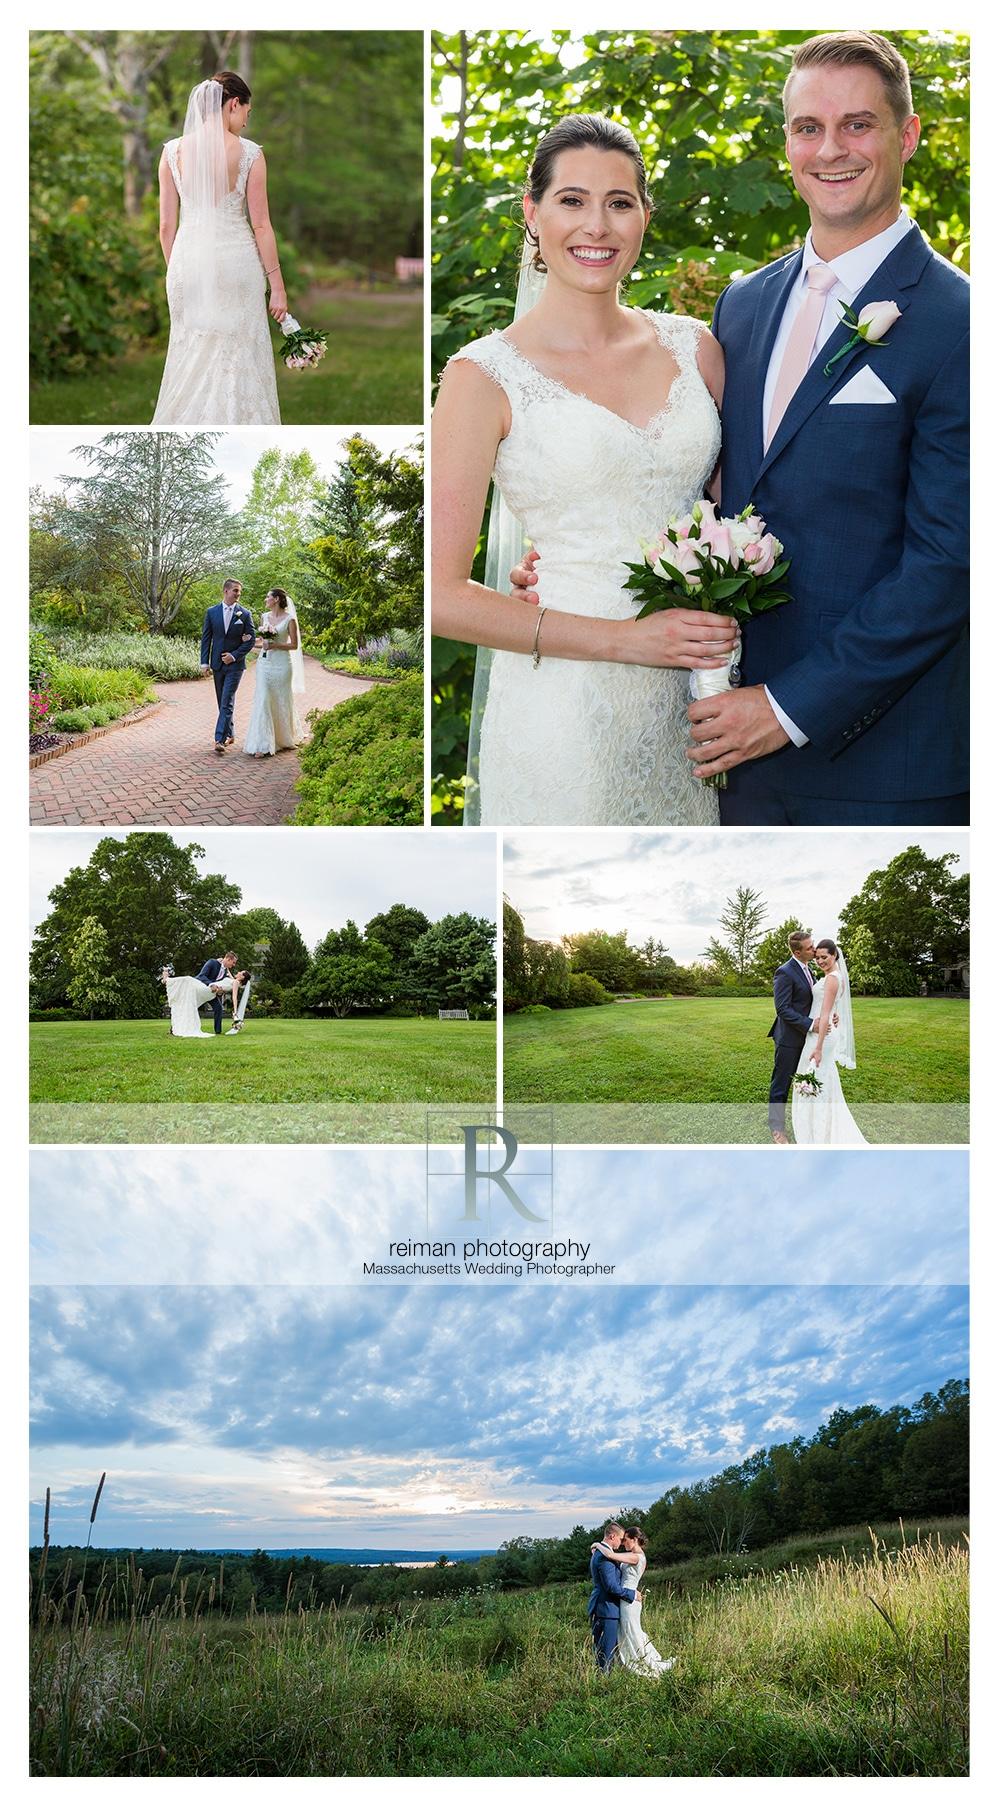 Elegant Wedding at Tower Hill, Tower Hill Botanical Garden, Reiman Photography, Summer, Wedding